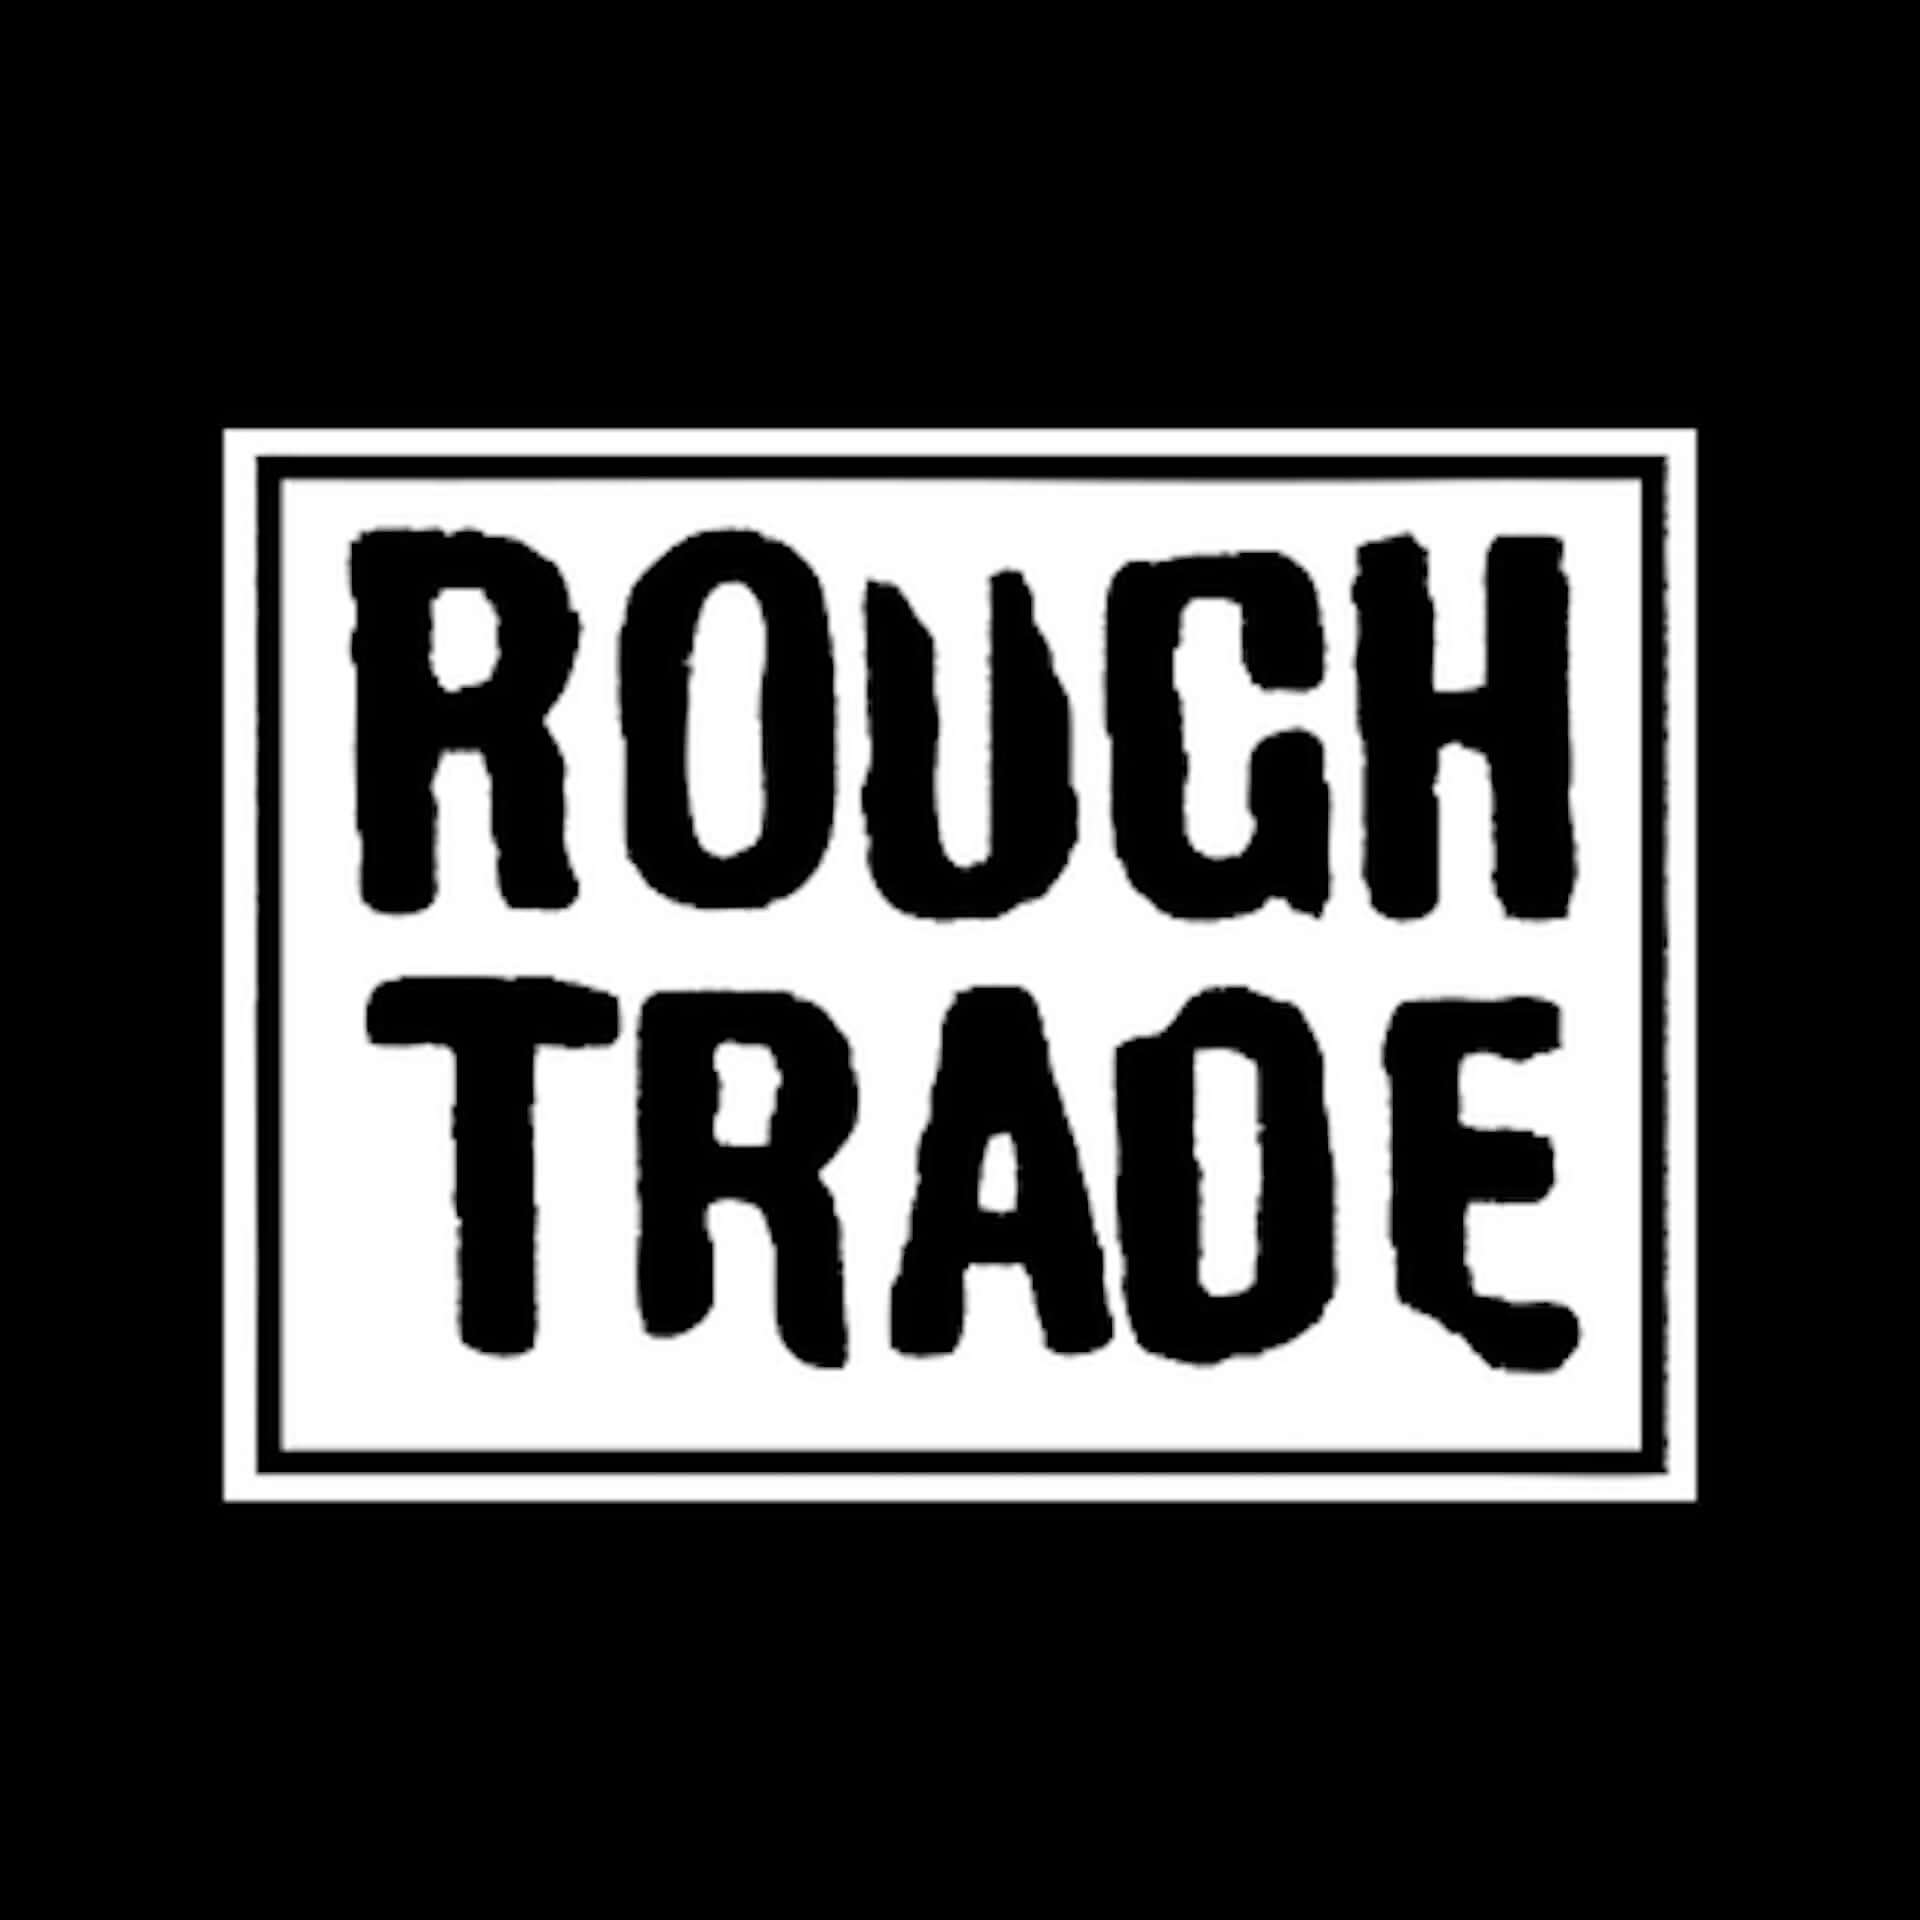 〈Rough Trade Records〉の特別展示が代官山蔦屋書店にて開催決定!ジェフ・トラヴィスが選んだ名盤など展示&新作グッズも販売 music201015_roughtrade-tsite_10-1920x1920